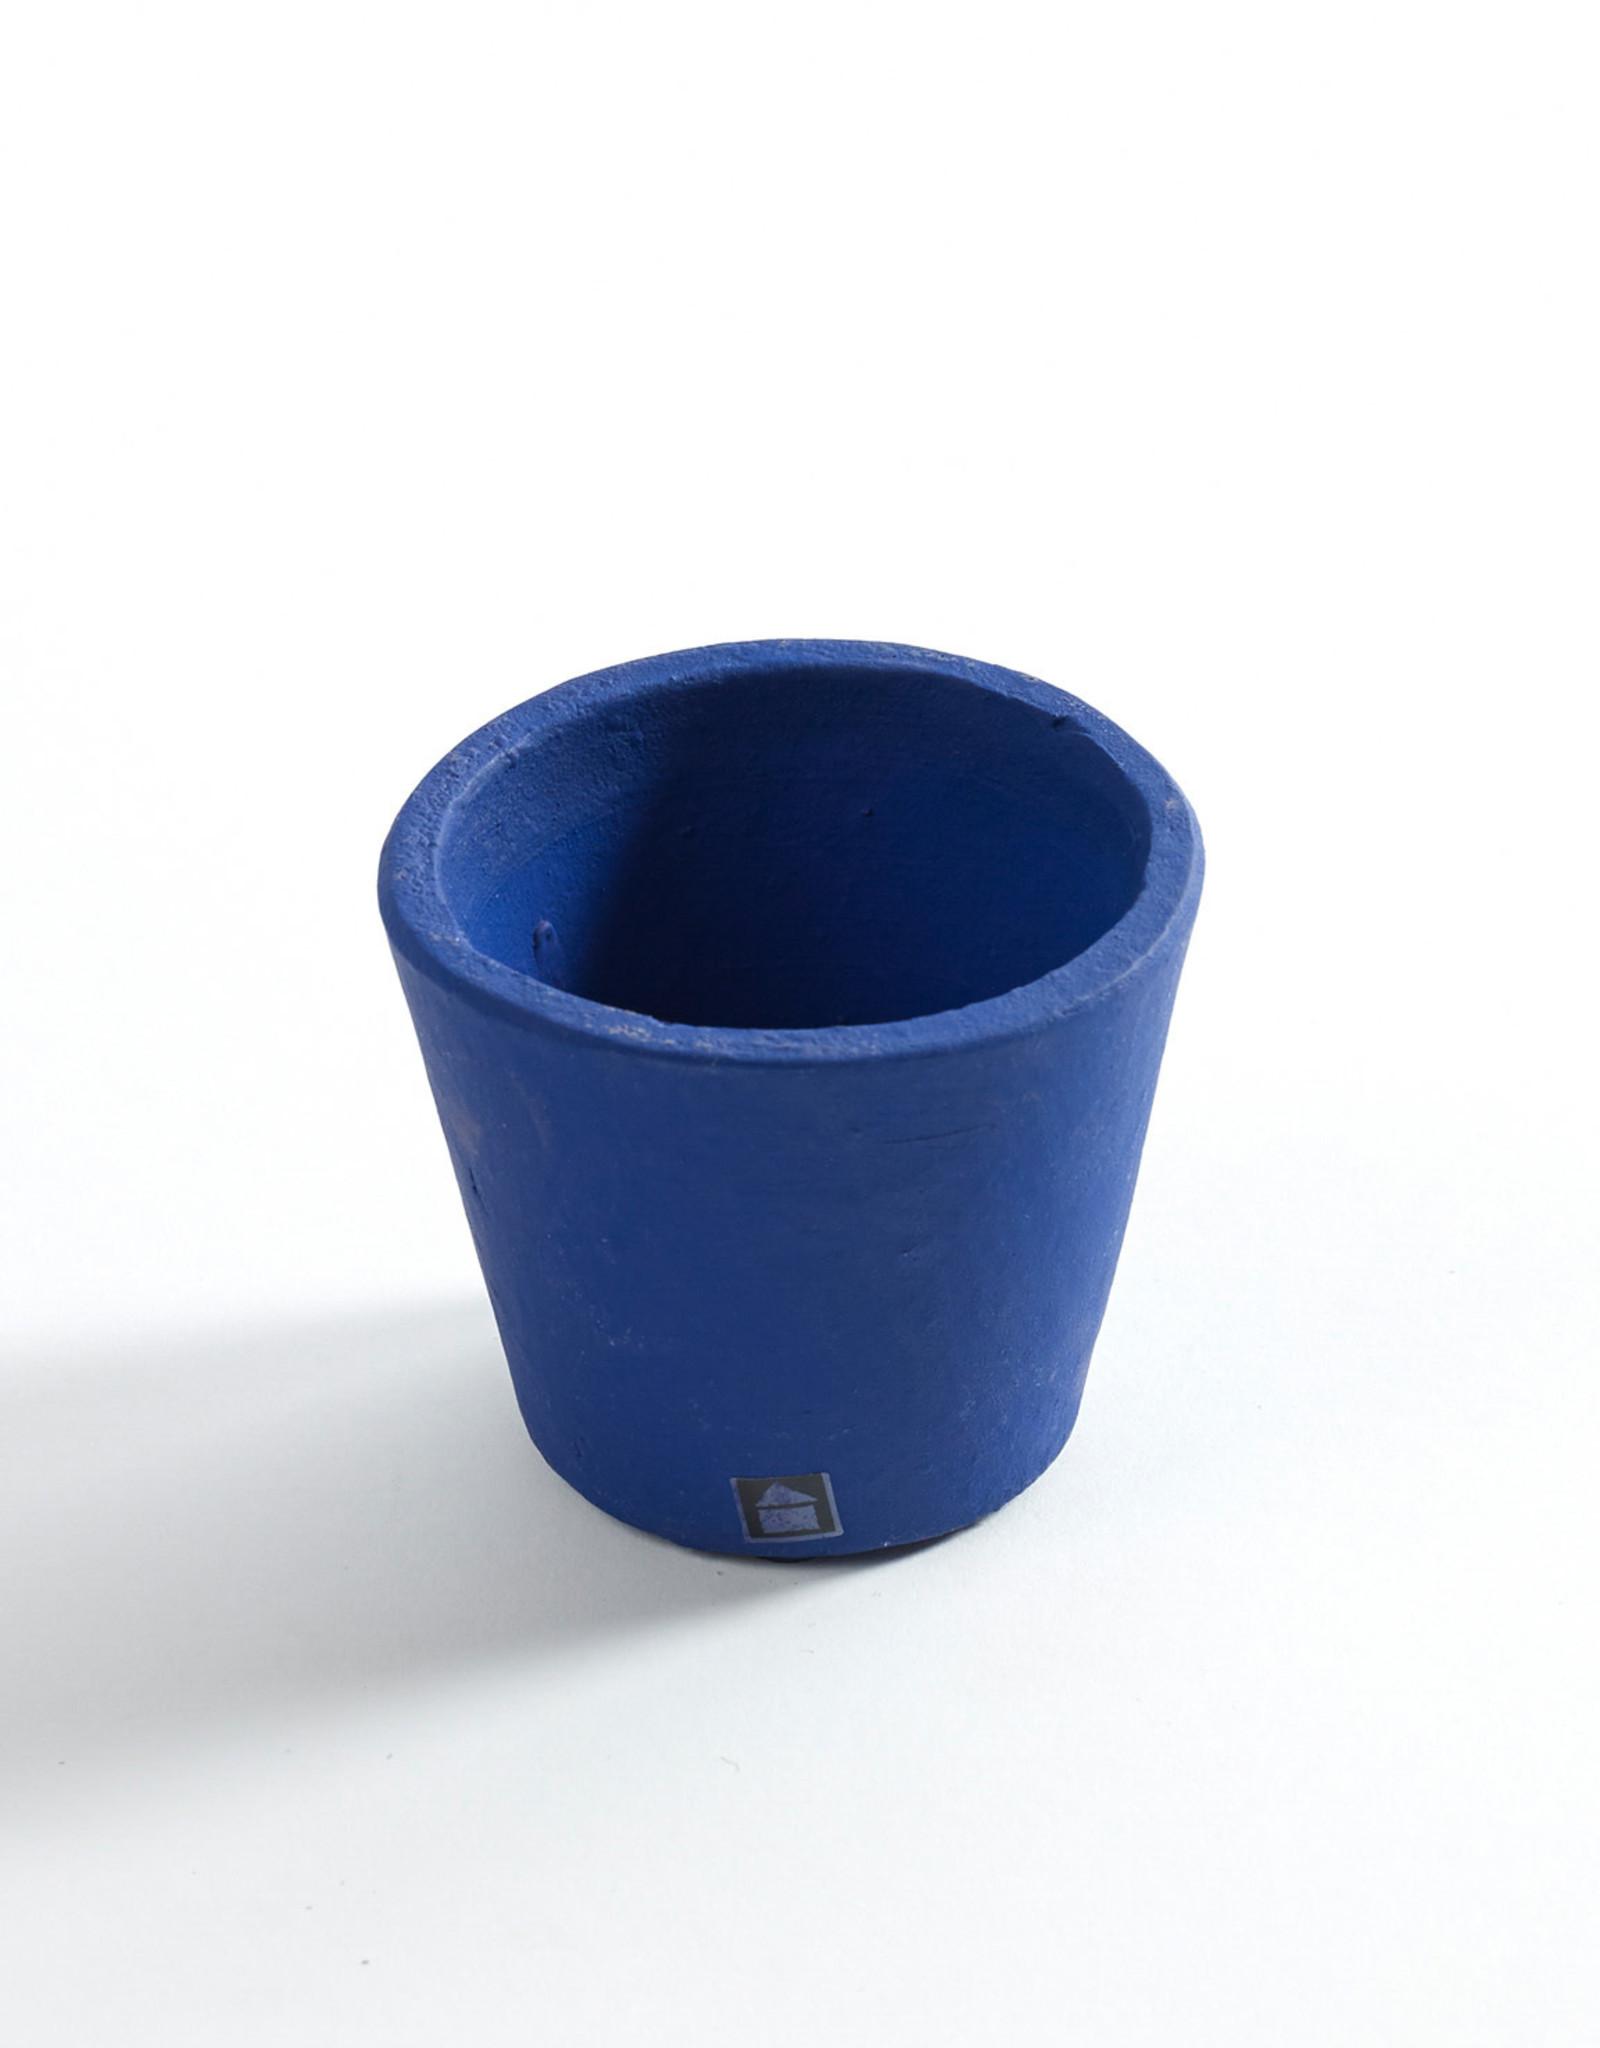 serax Container Ø7 - Navy Blue